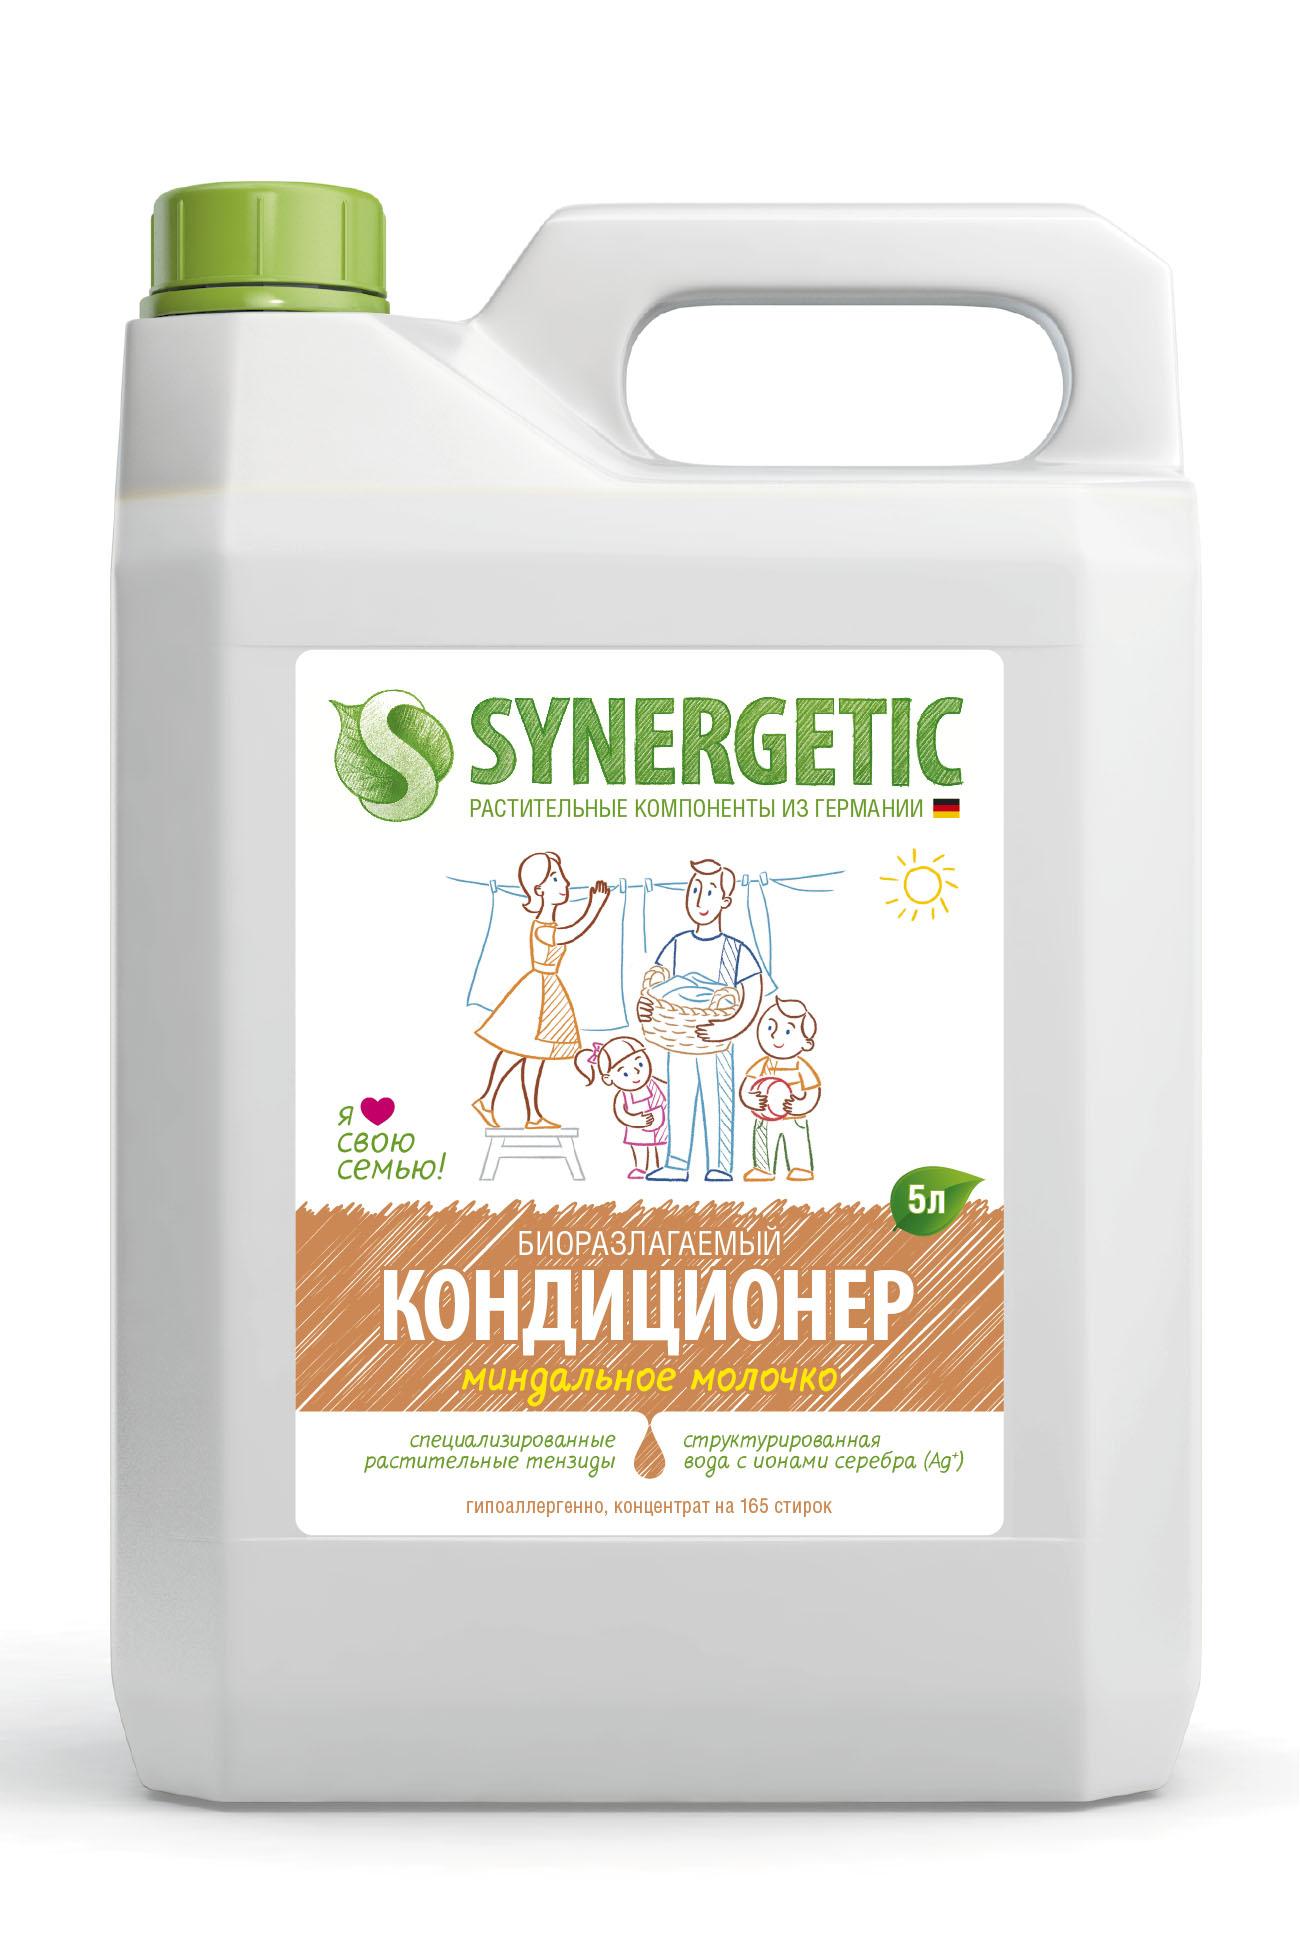 Средства для стирки Synergetic Кондиционер для белья Synergetic «Миндальное молочко» 5 л кондиционер для белья synergetic 5 л